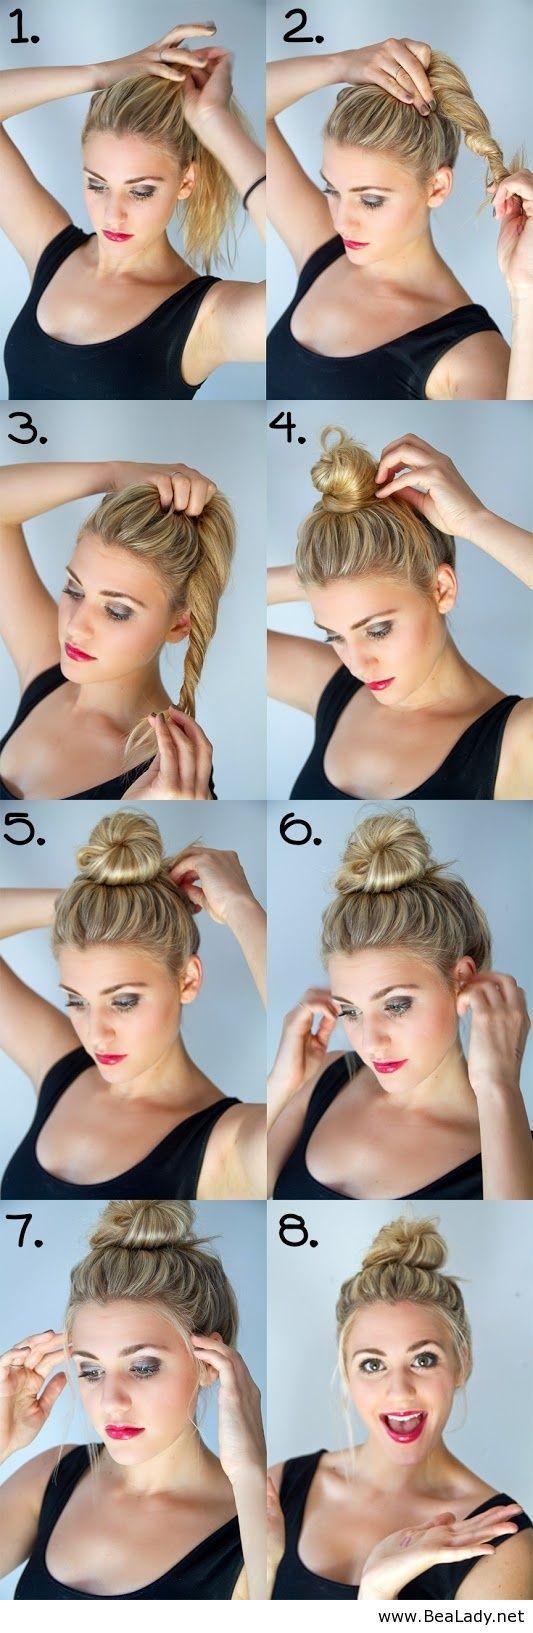 Maccosmetics on hair pinterest hair hair styles and hair